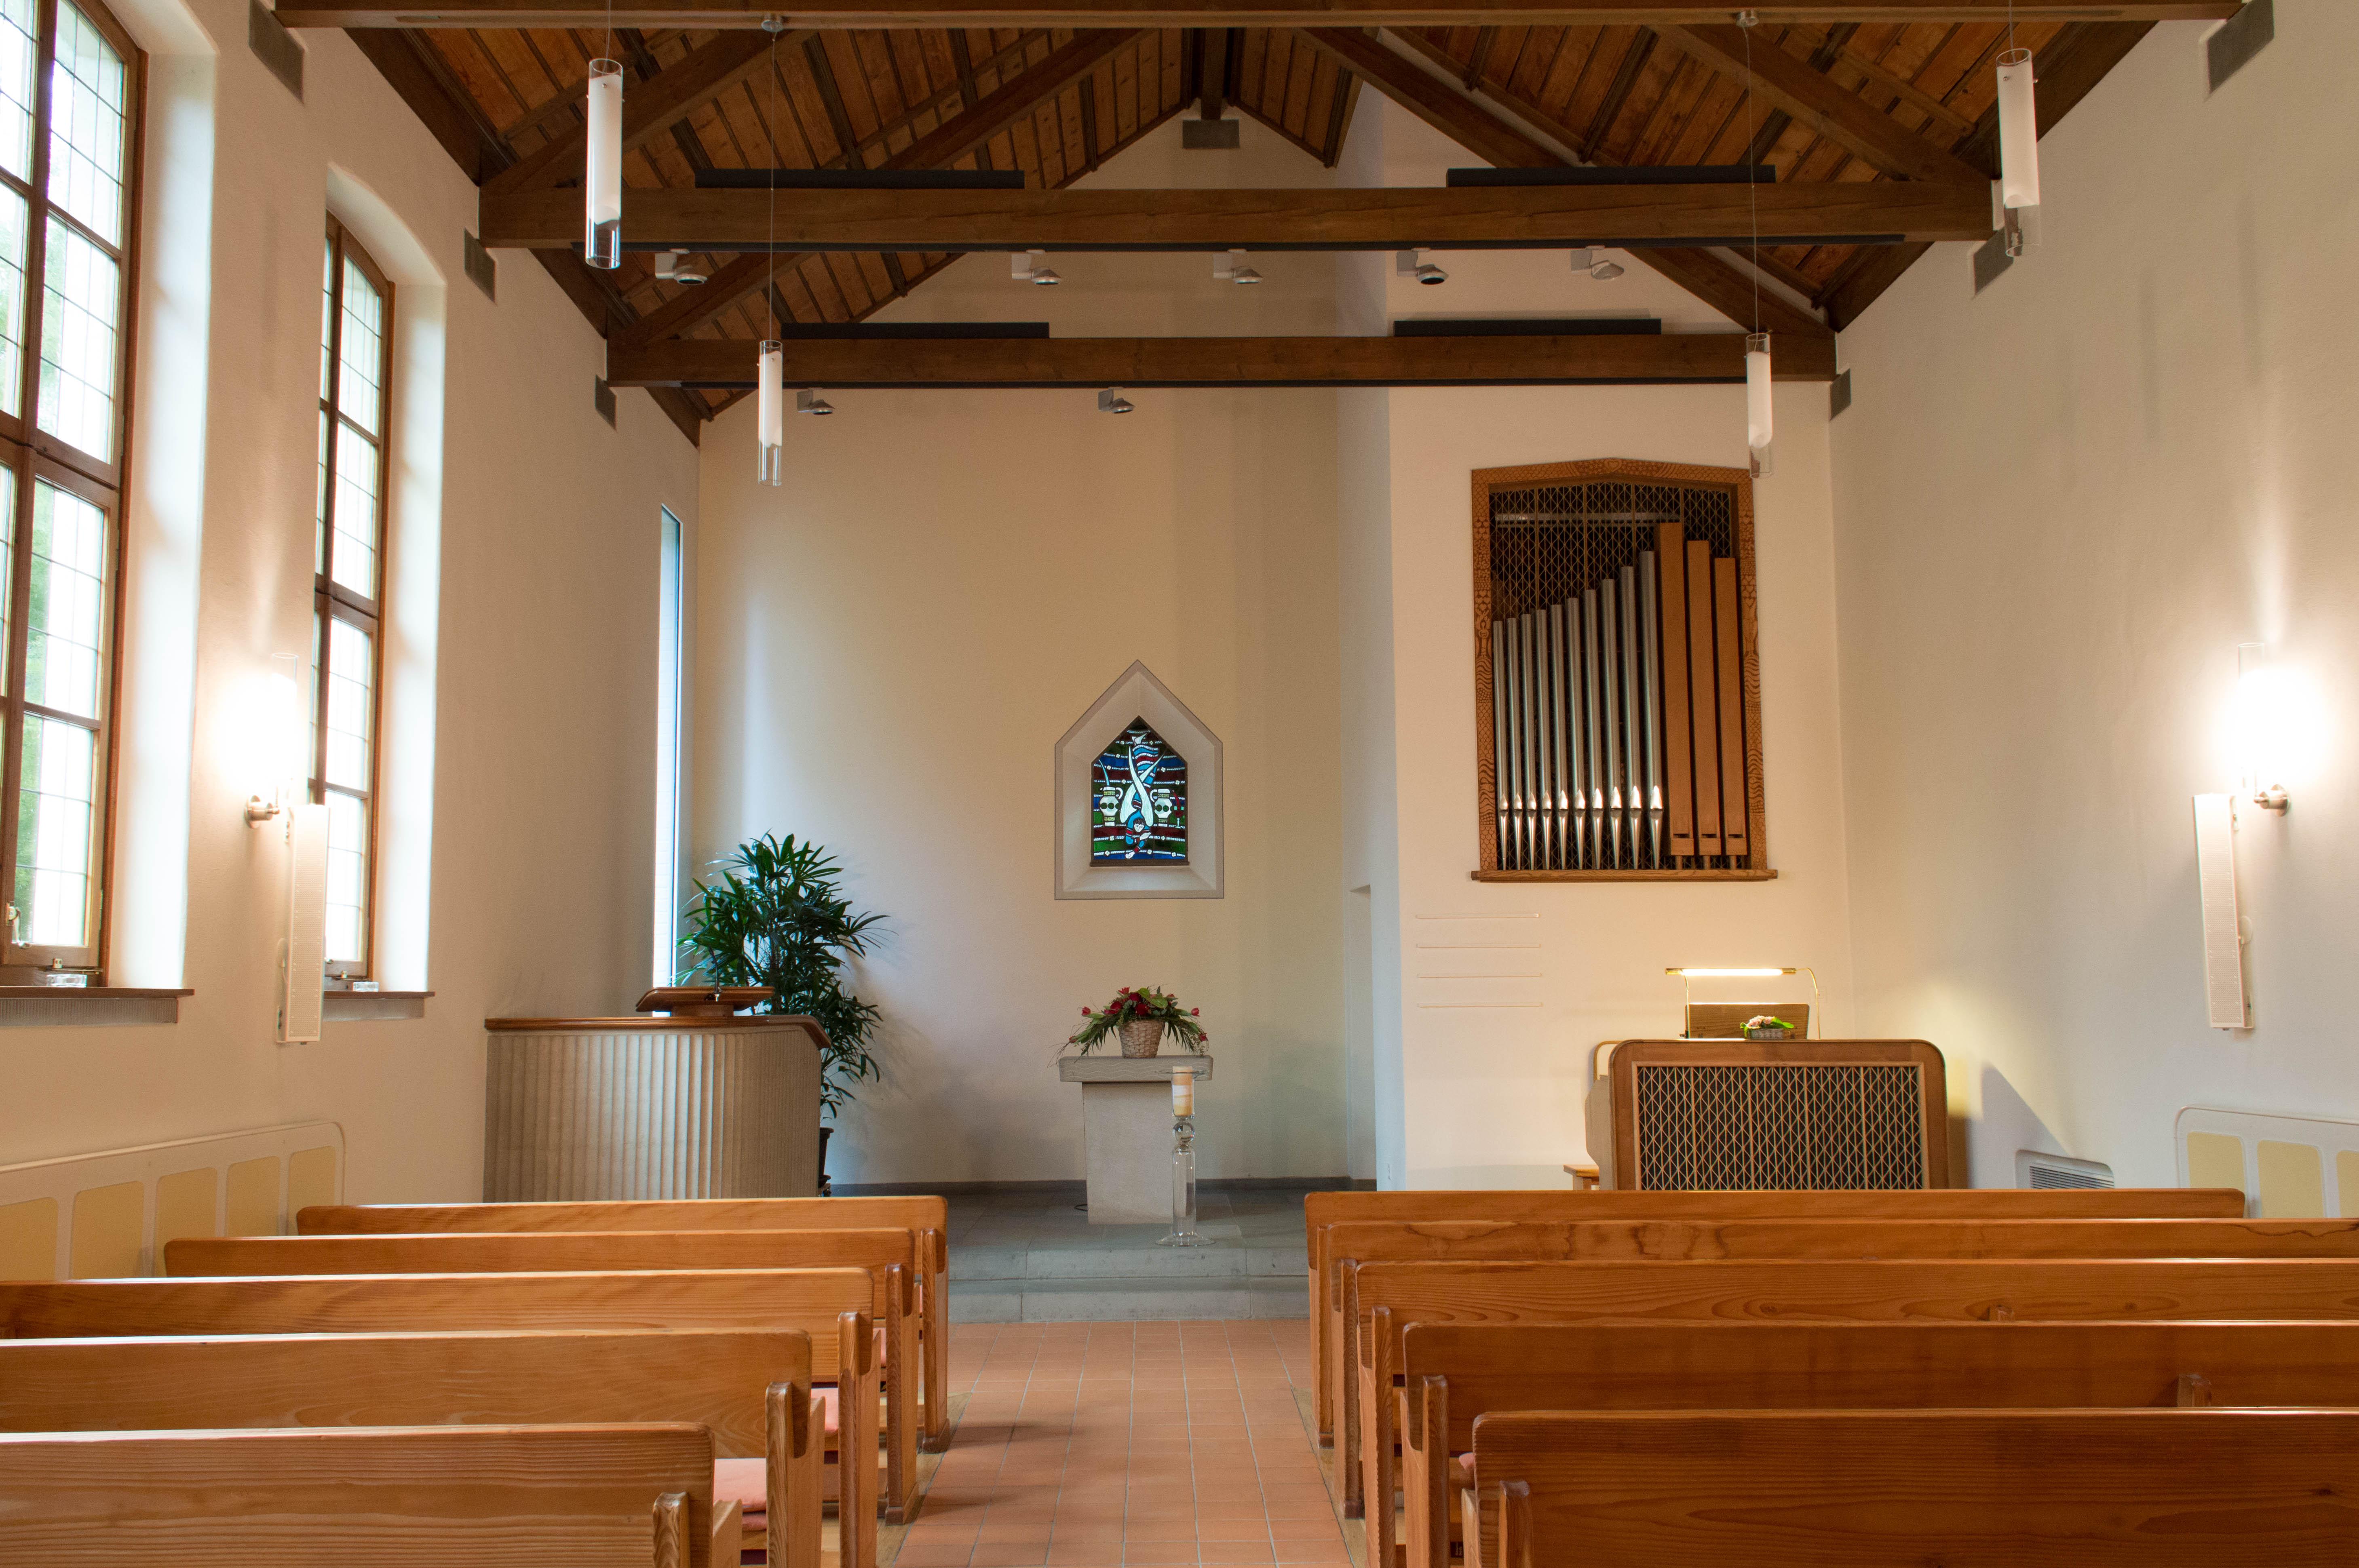 Hergiswil Reformierte Kirche Genforge